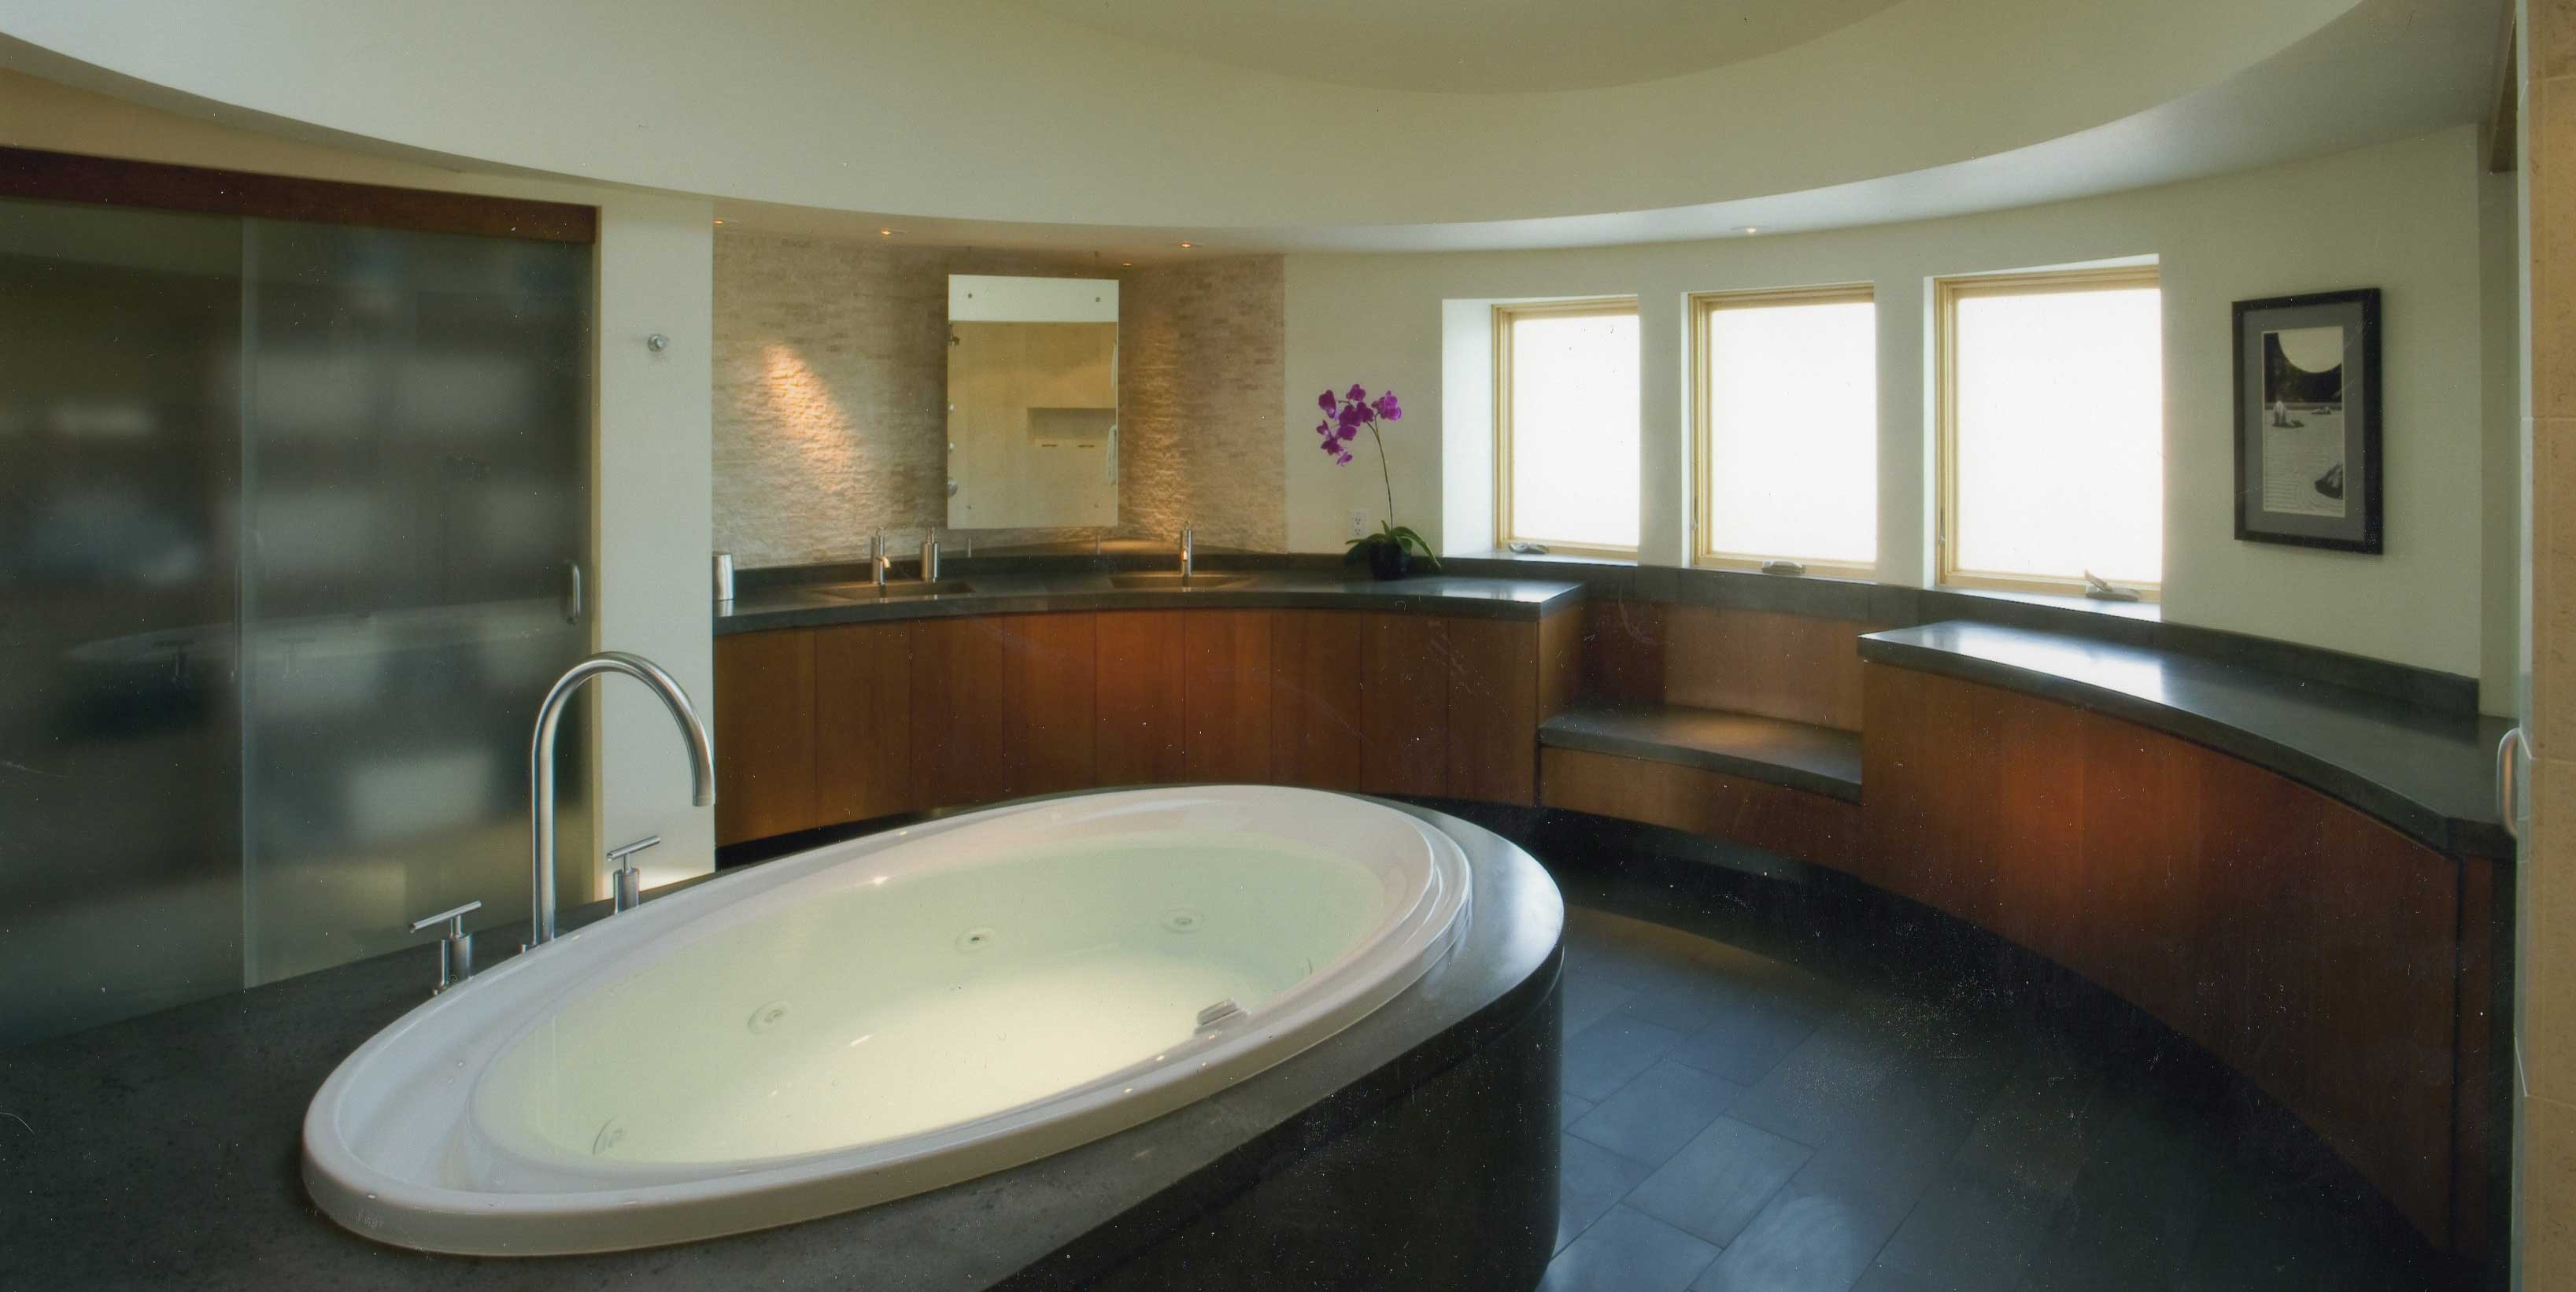 Kitchen Cabinets | Bathroom Cabinets | Madison WI ...